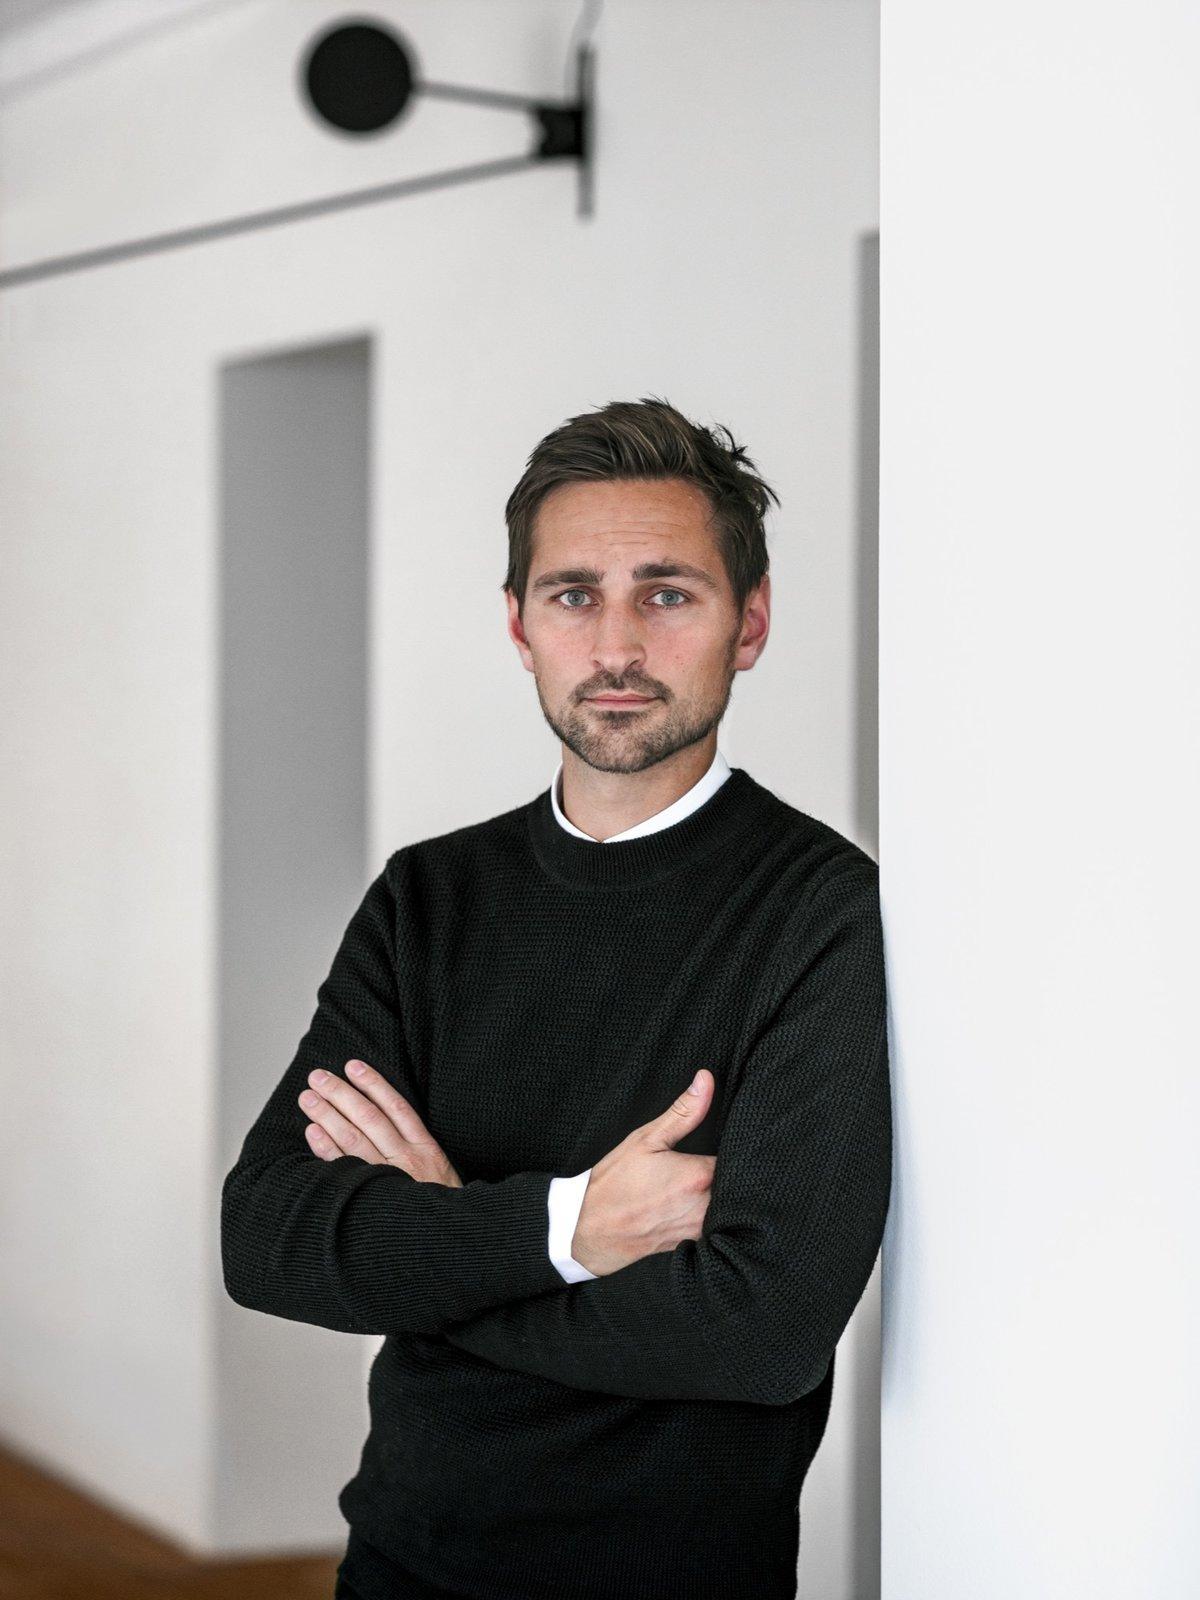 Architect Håkon Matre Aasarød